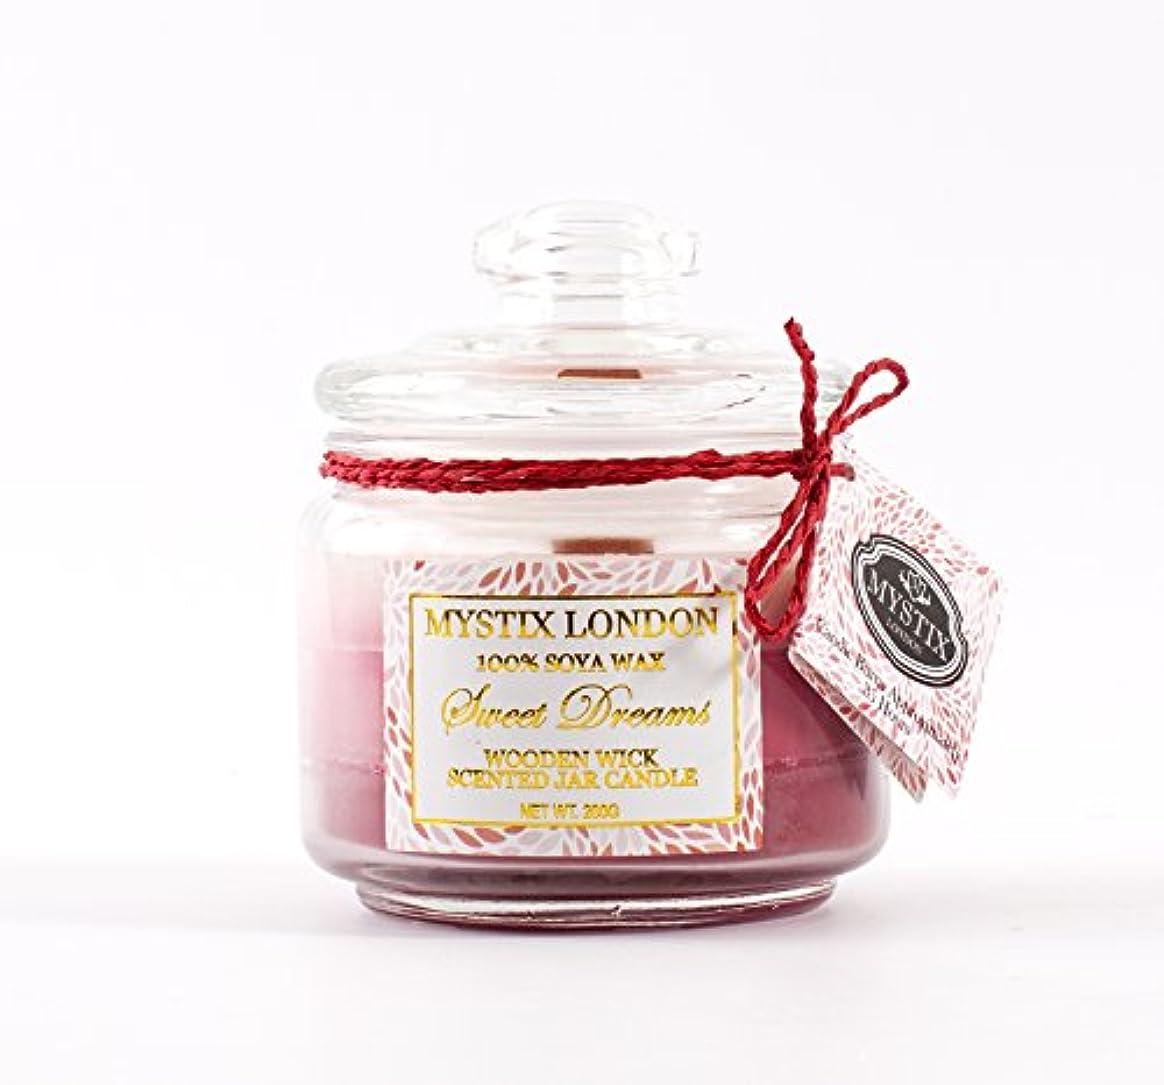 機構削減軽食Mystix London | Sweet Dreams Wooden Wick Scented Jar Candle 200g